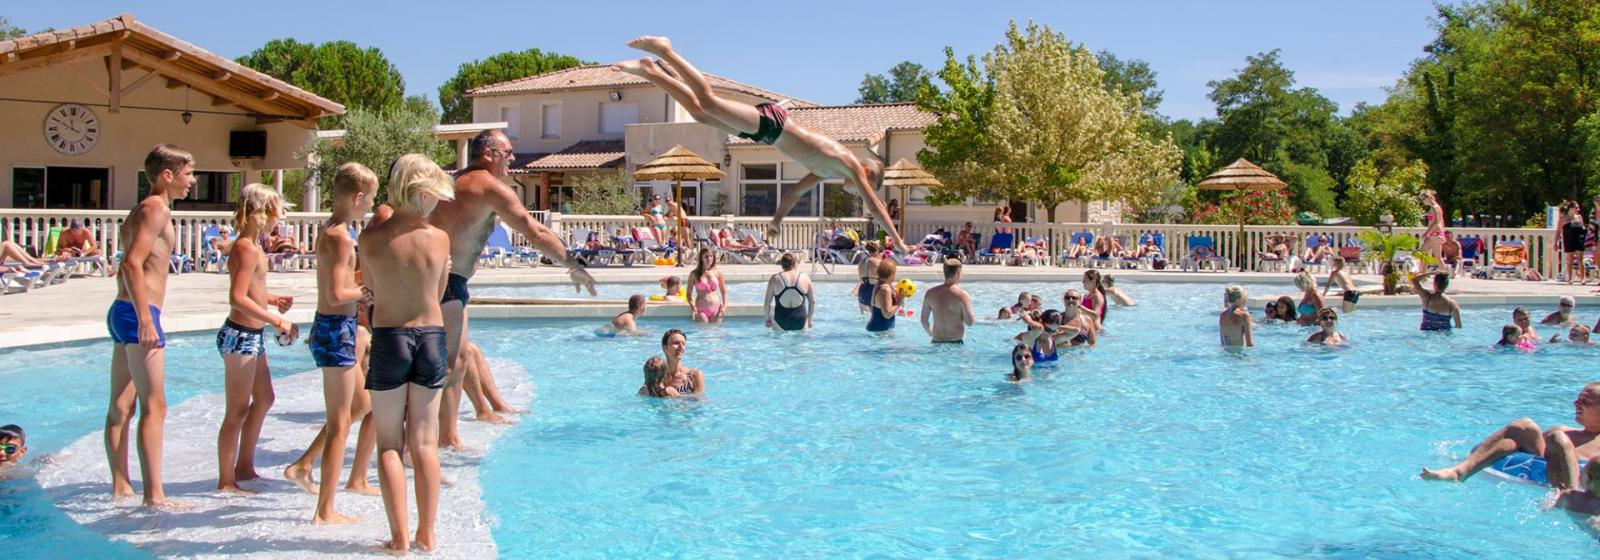 Camping Ardeche piscine